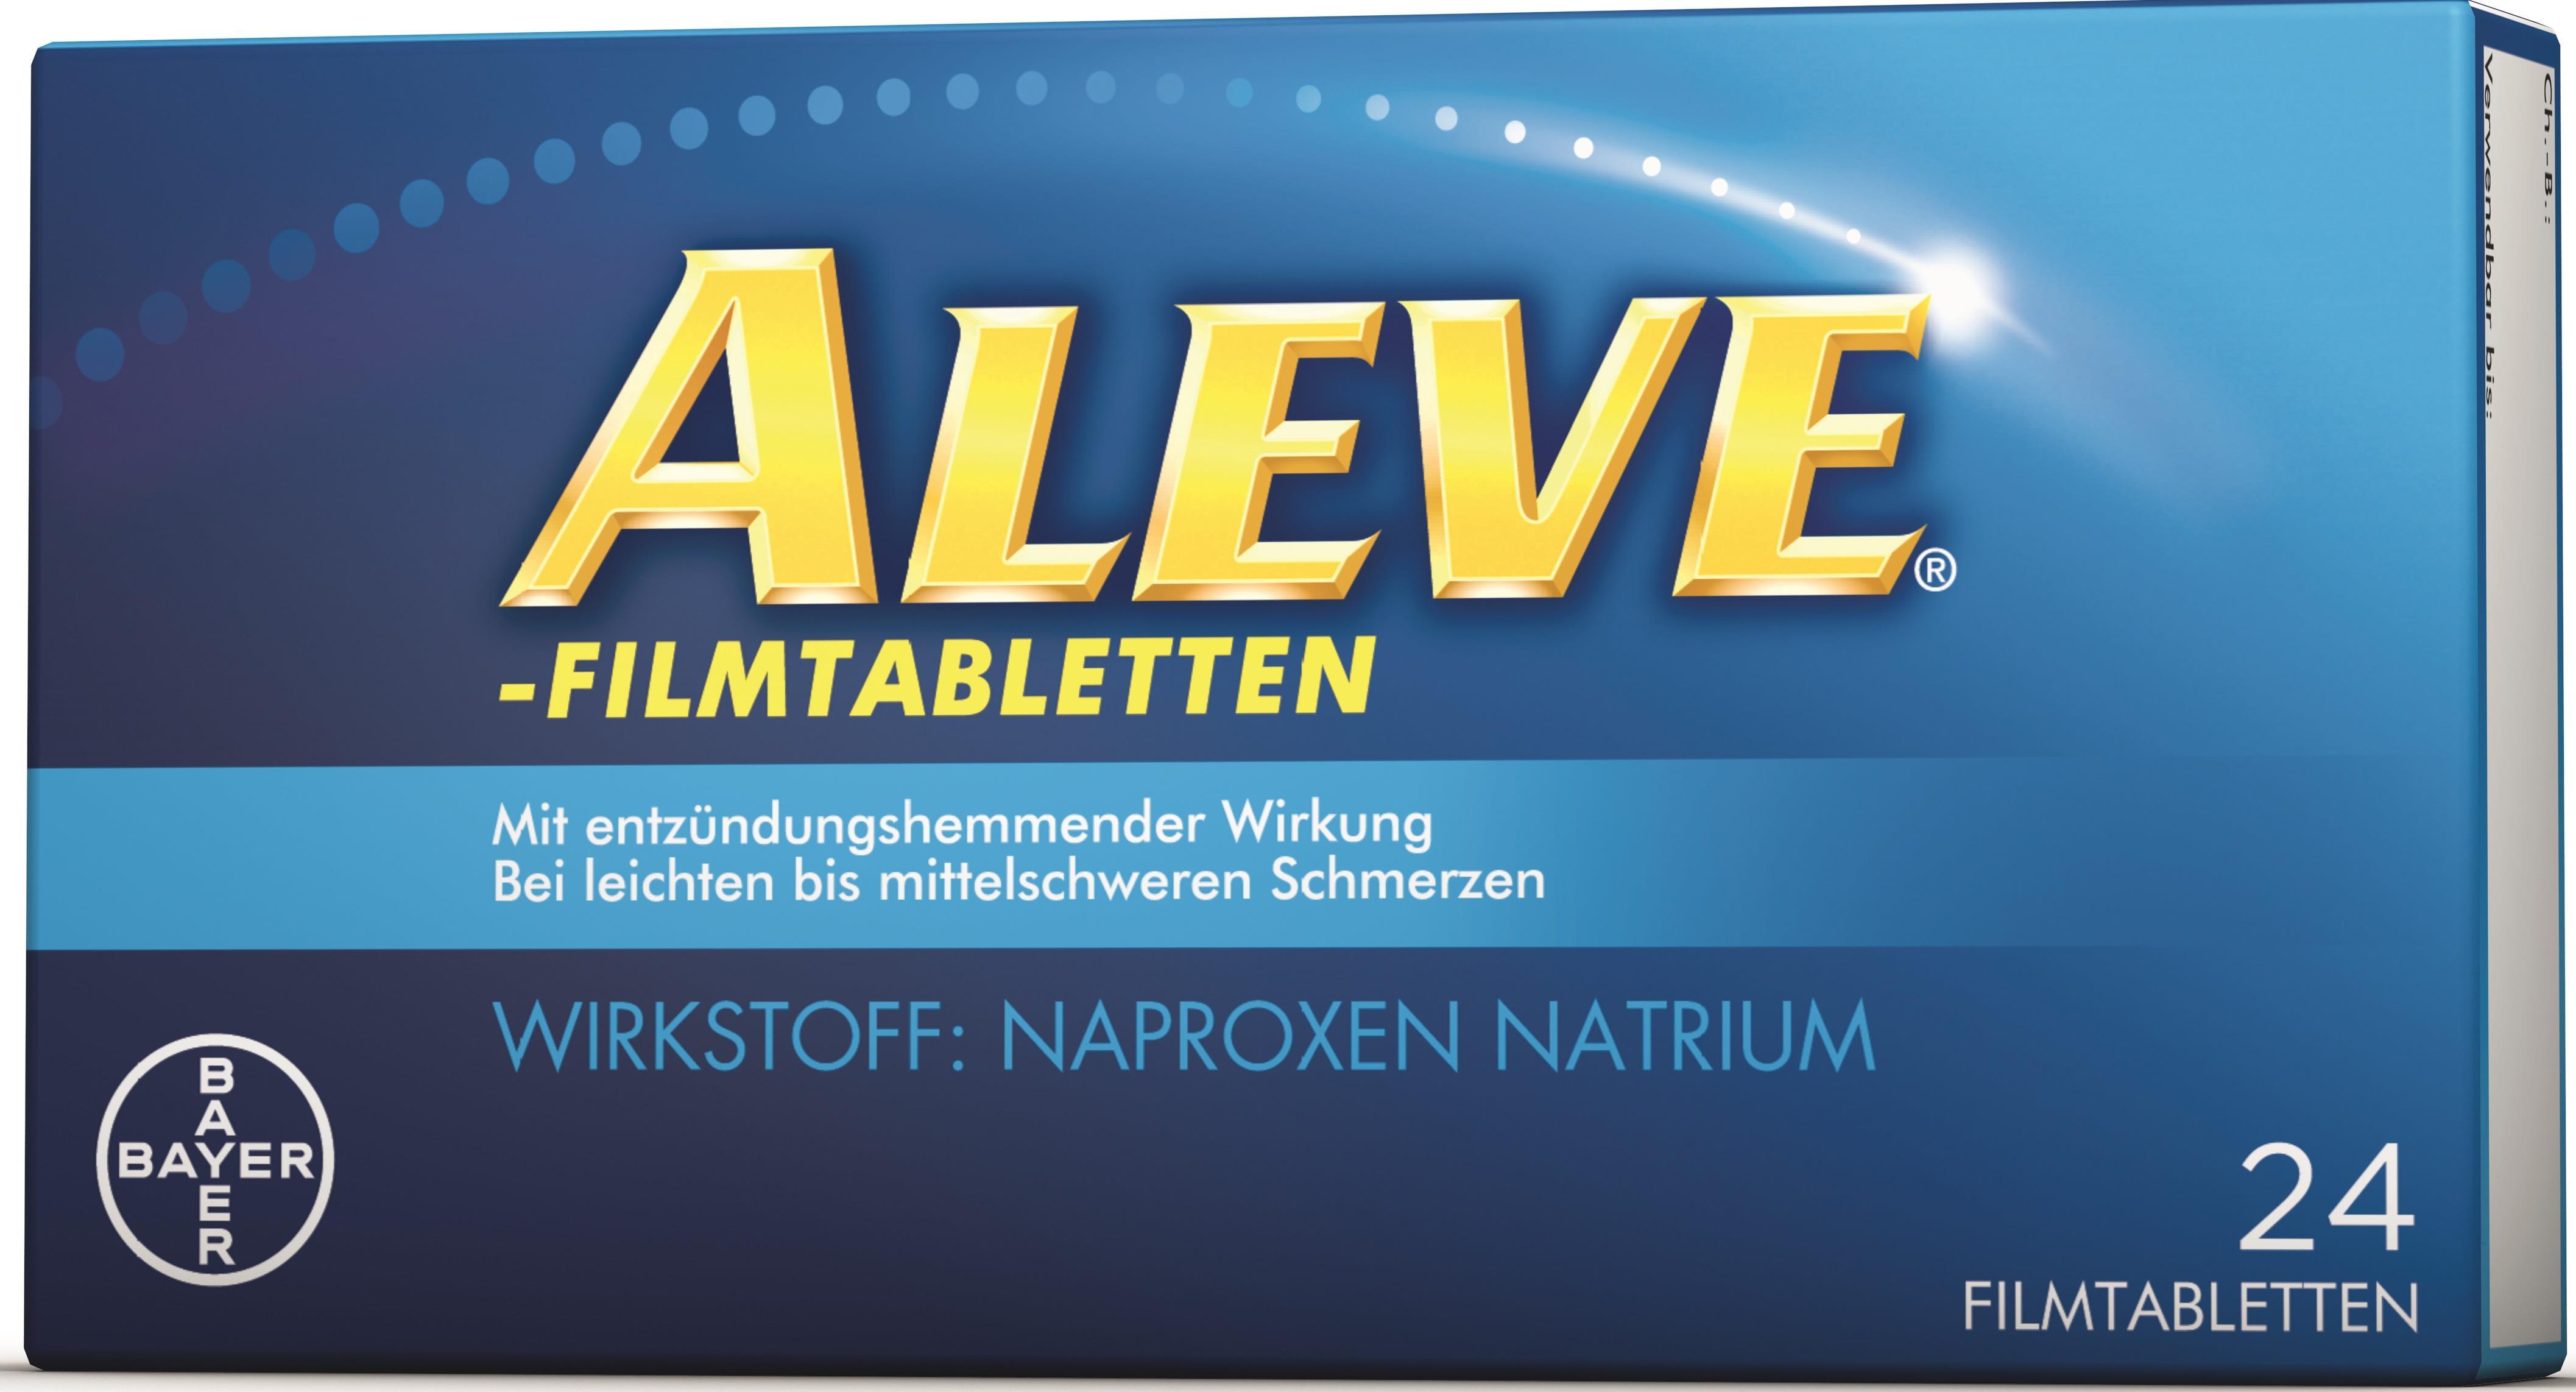 Aleve - Filmtabletten